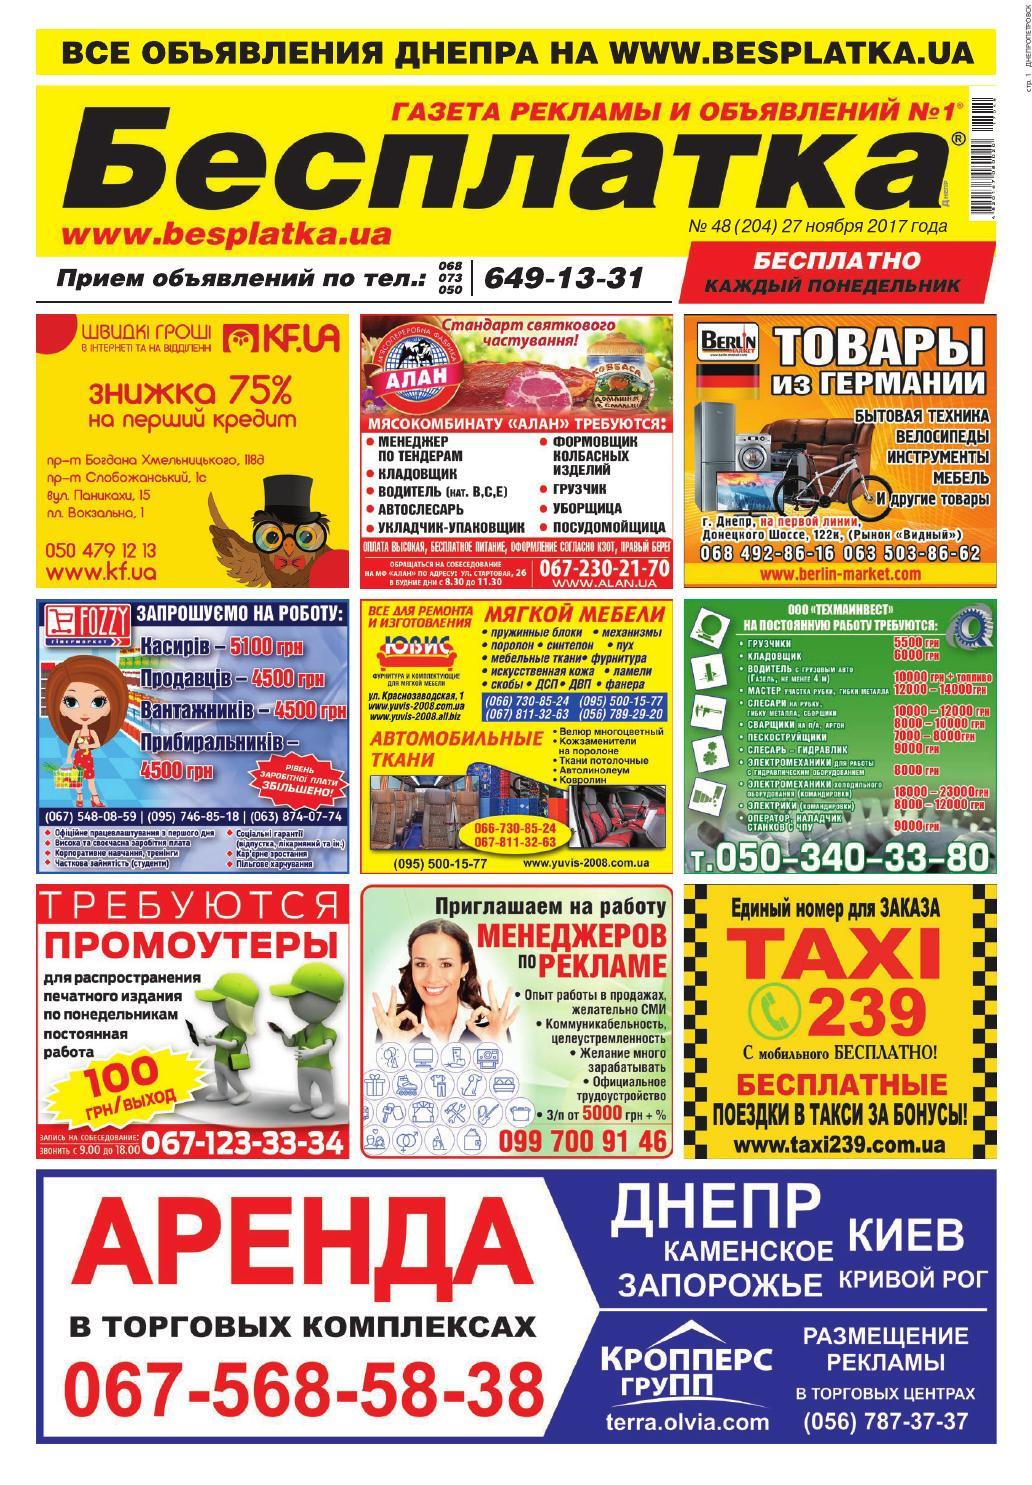 daff5f4ec55c Besplatka #48 Днепр by besplatka ukraine - issuu